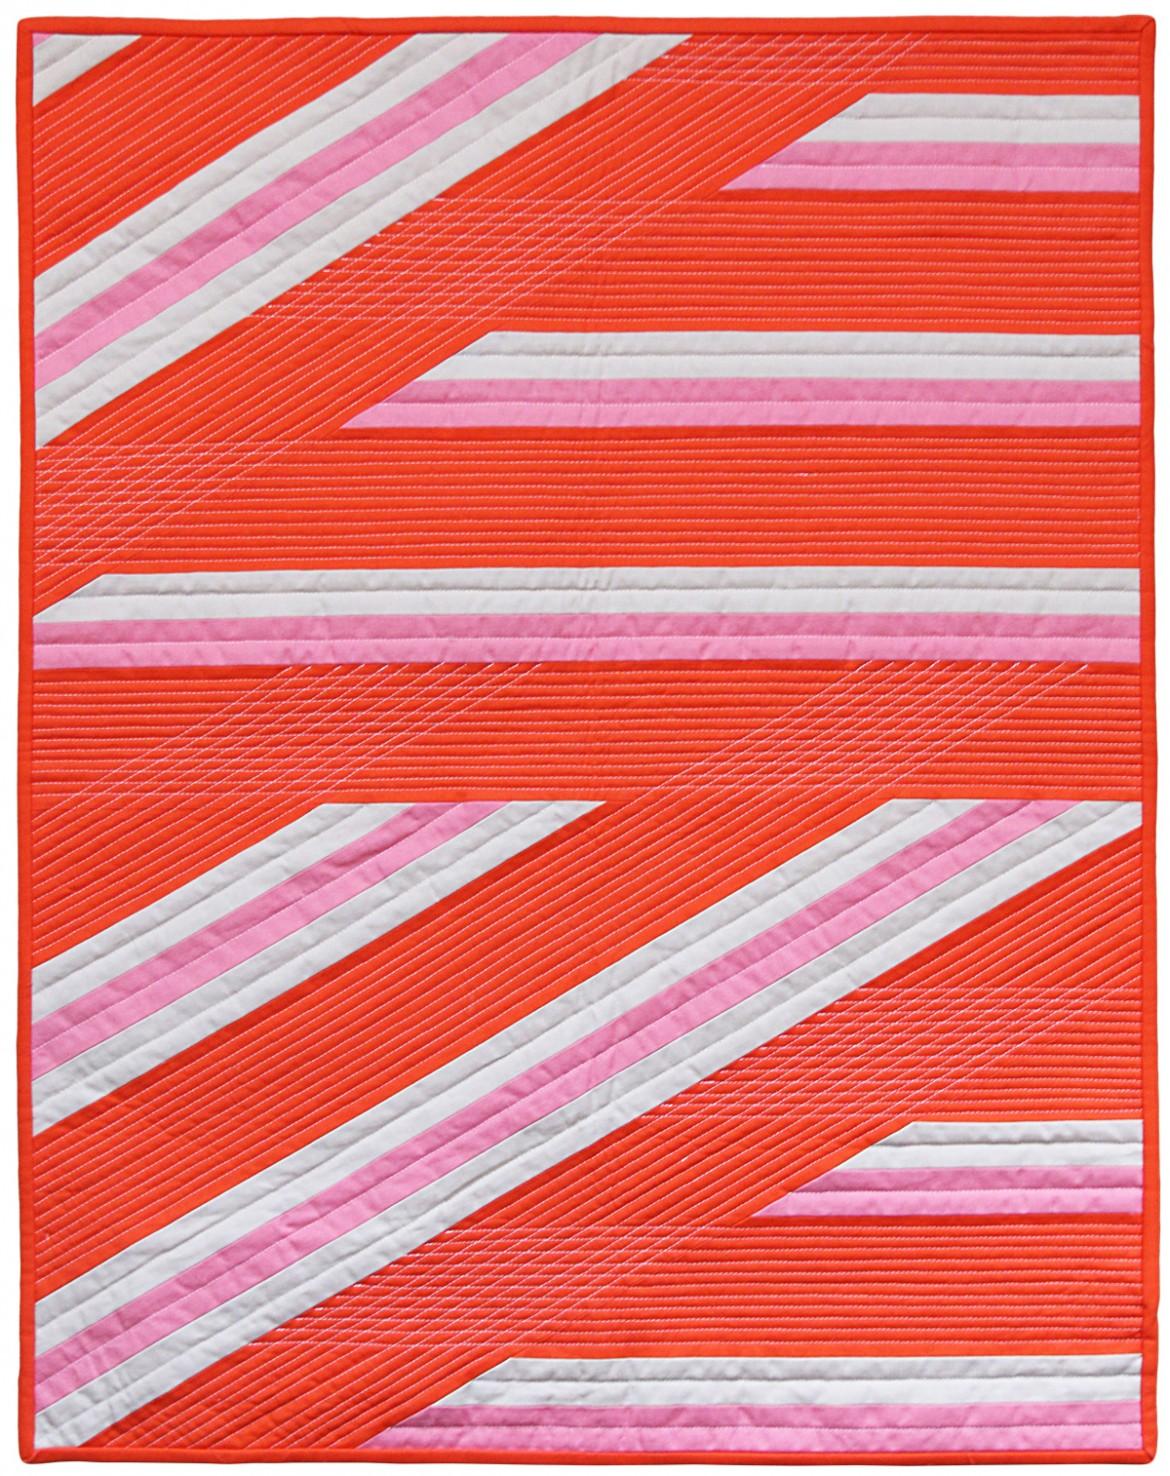 Helix Modern Quilt by Nicole Neblett